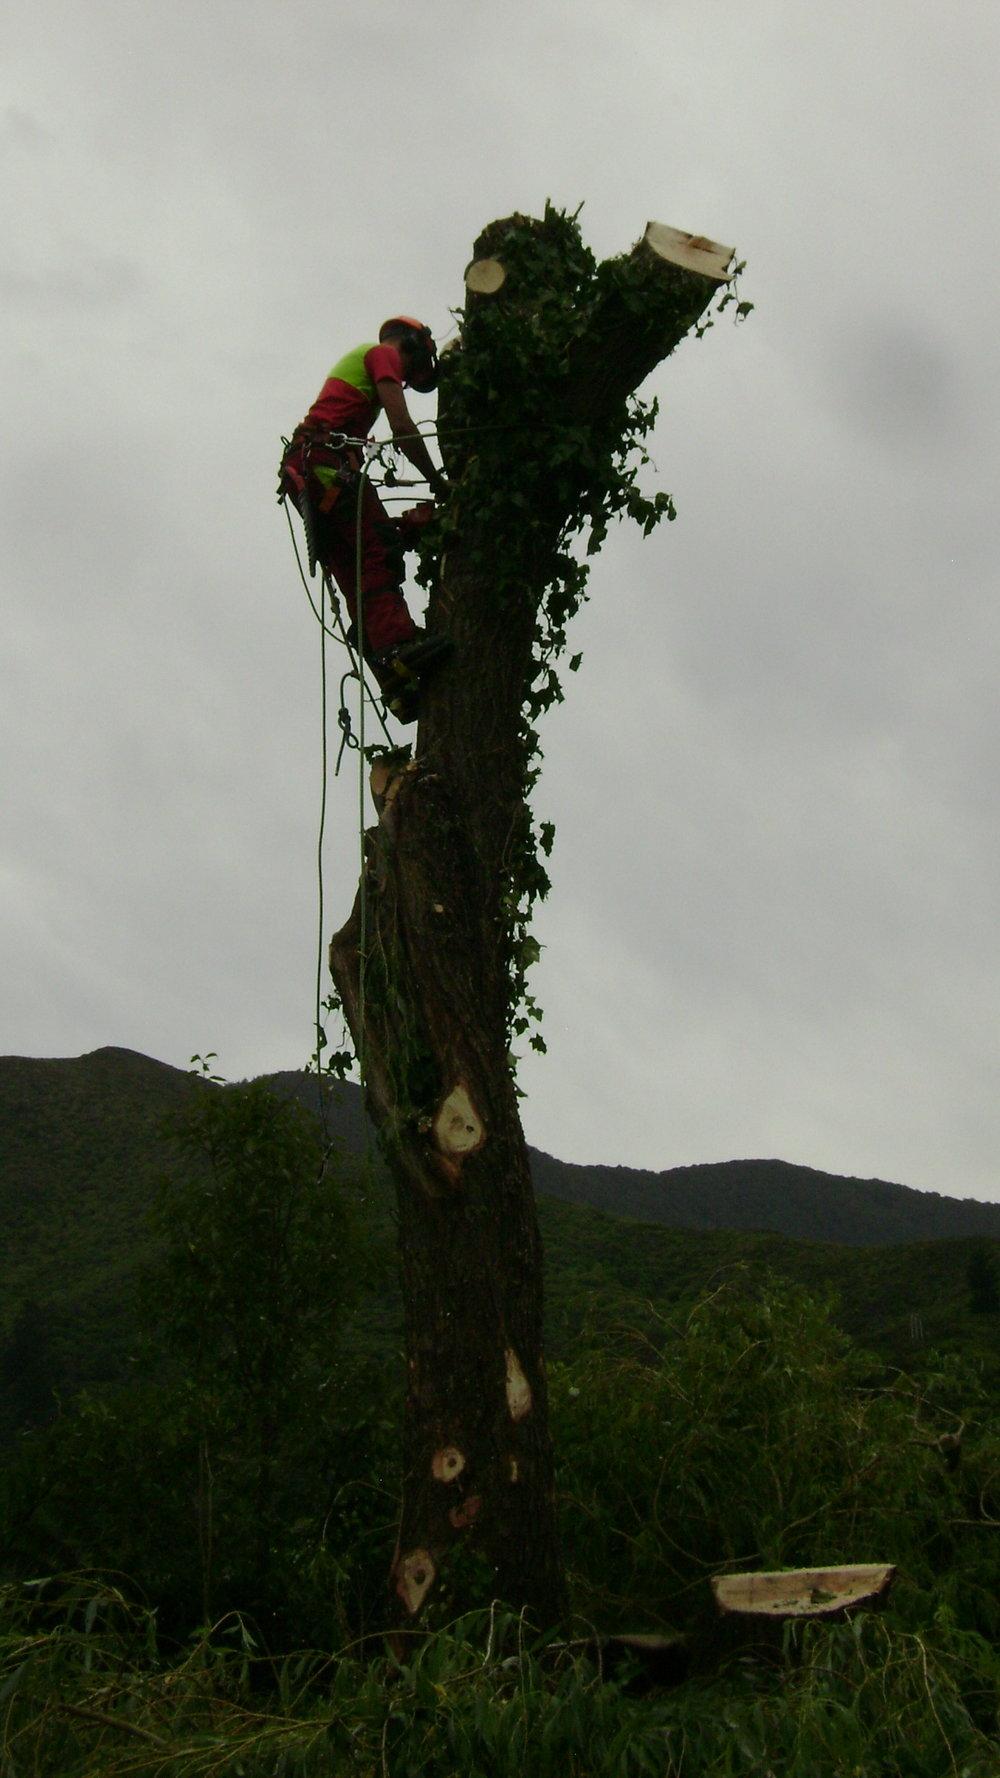 willow picton (28).JPG